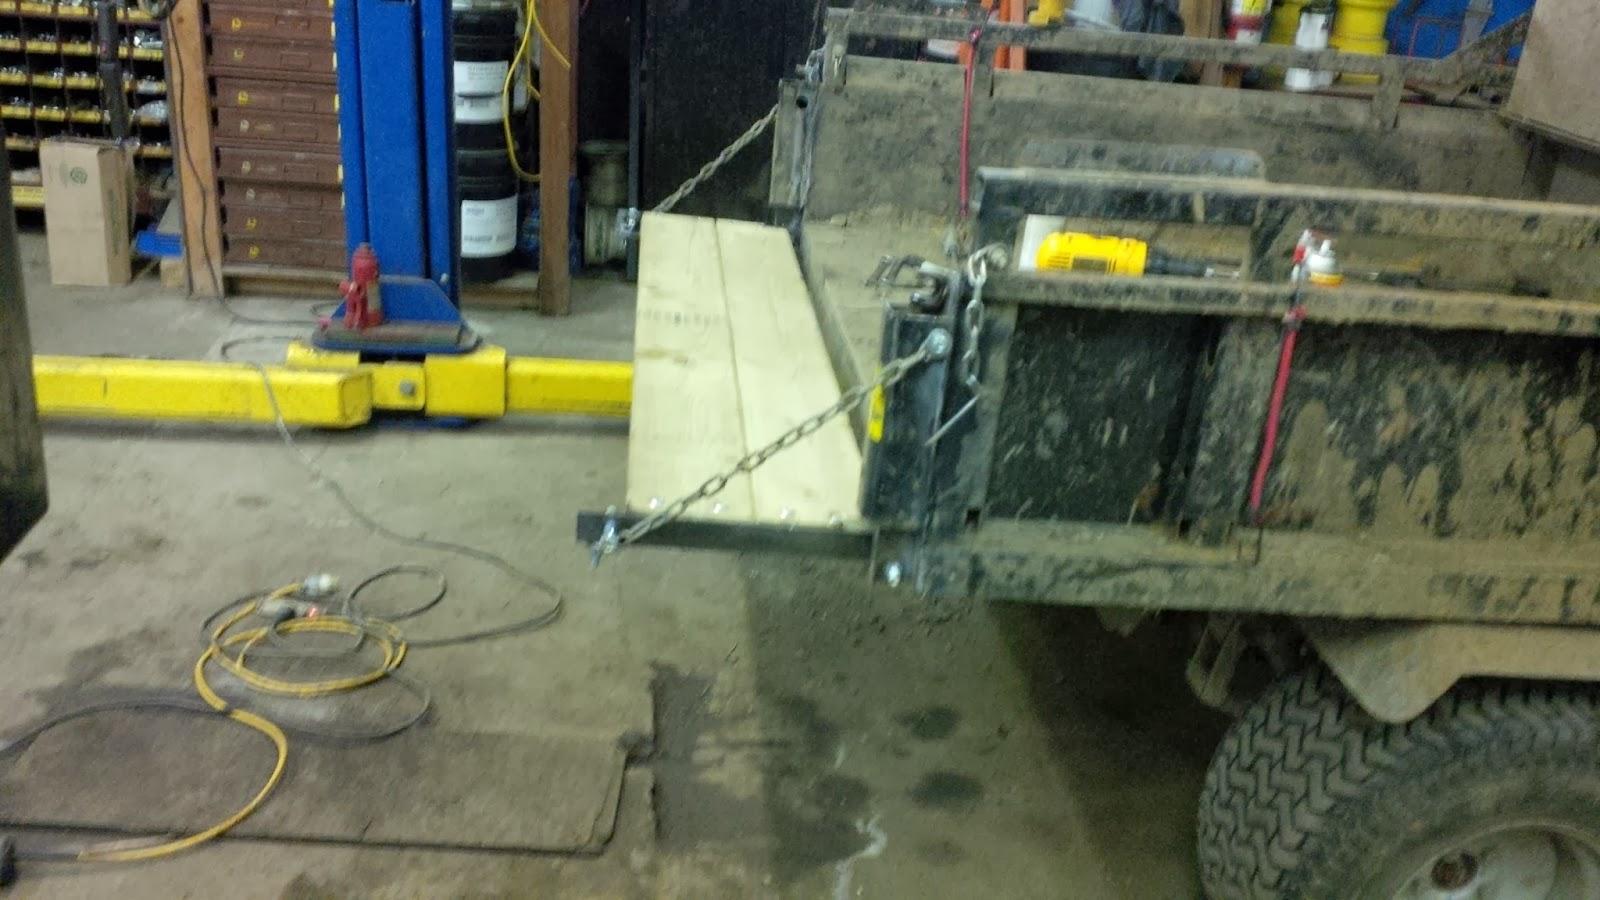 Dump Bed Tailgate Hinge Removable Pin : Bobs shop cushman tailgate mod